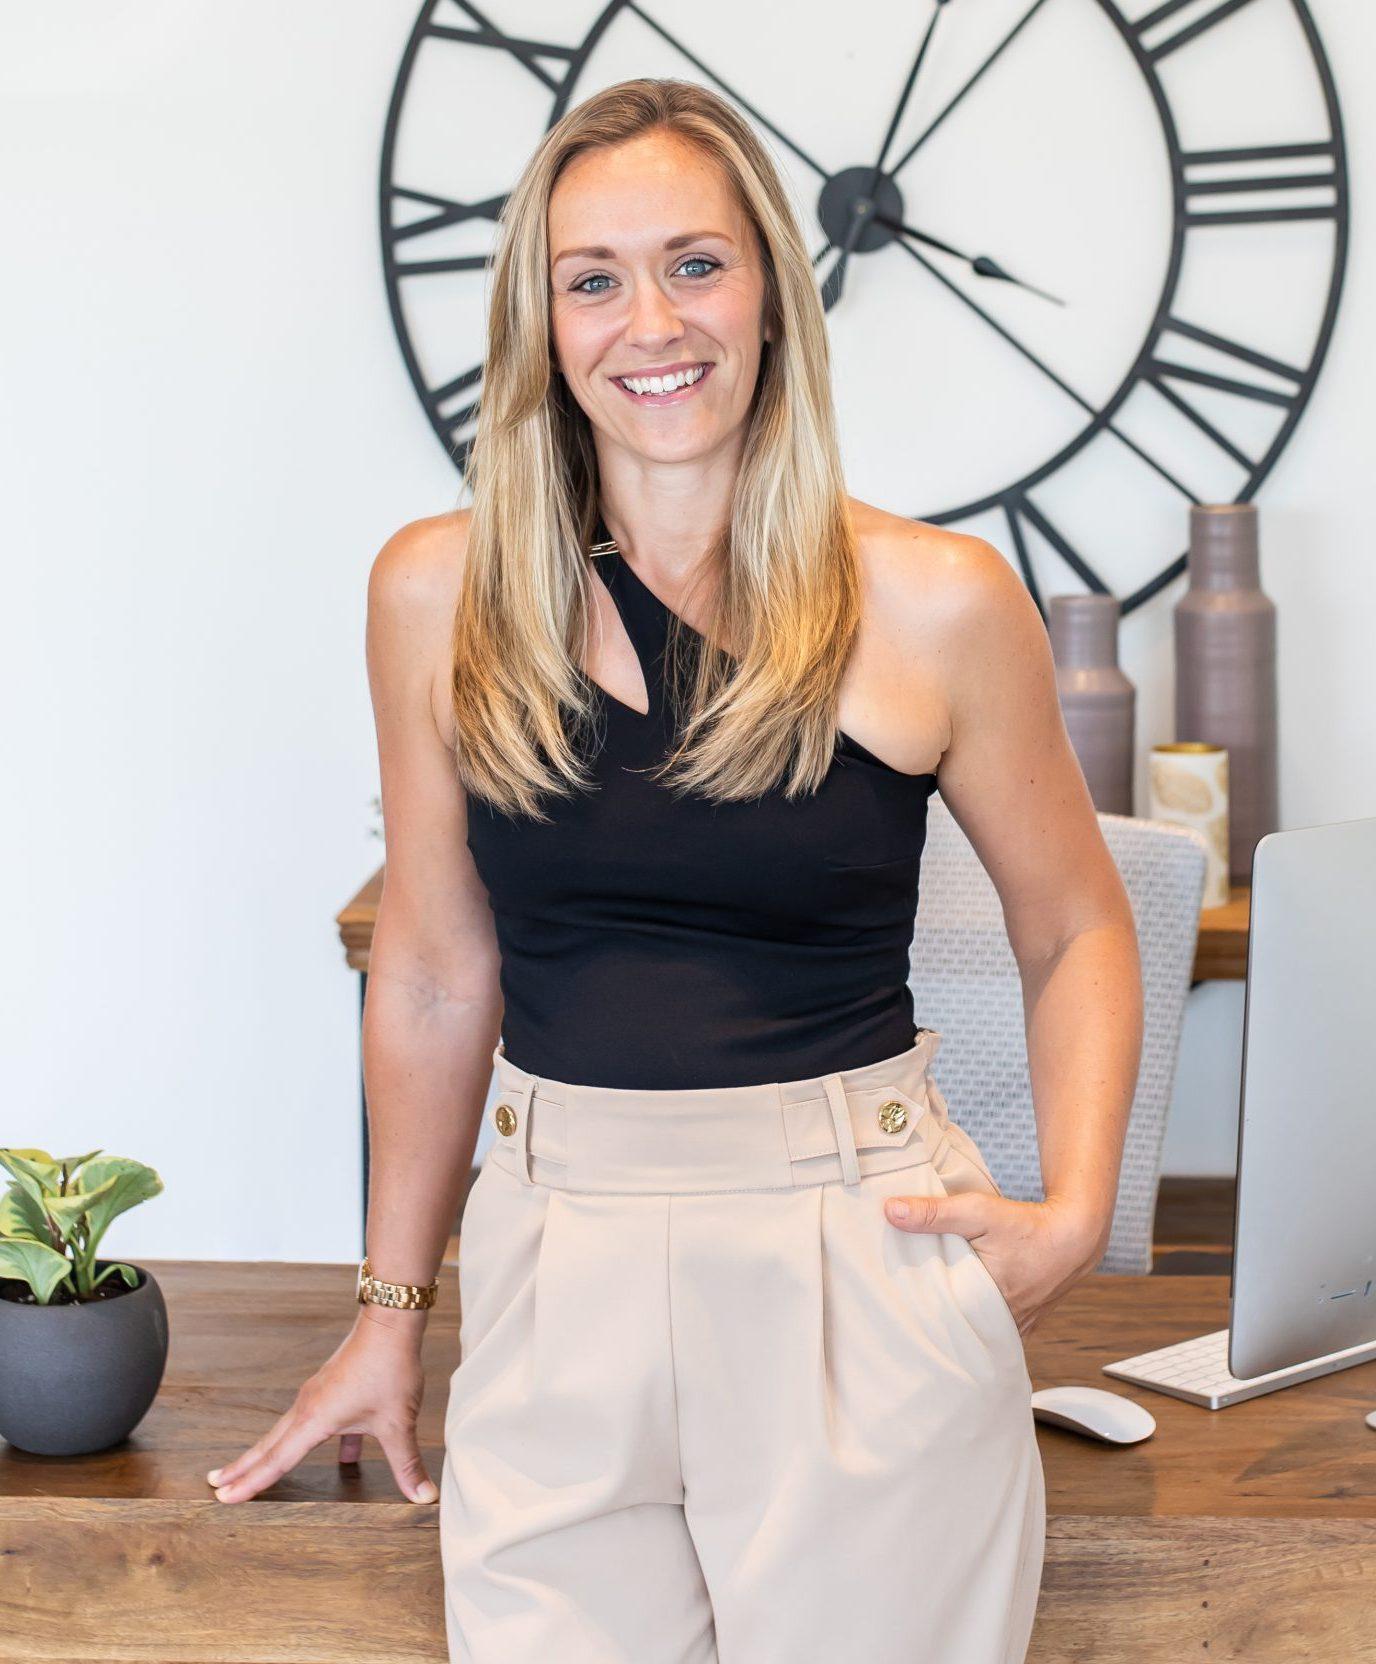 Jenny Hilborn, founder and principal designer at Centre Staged Designs